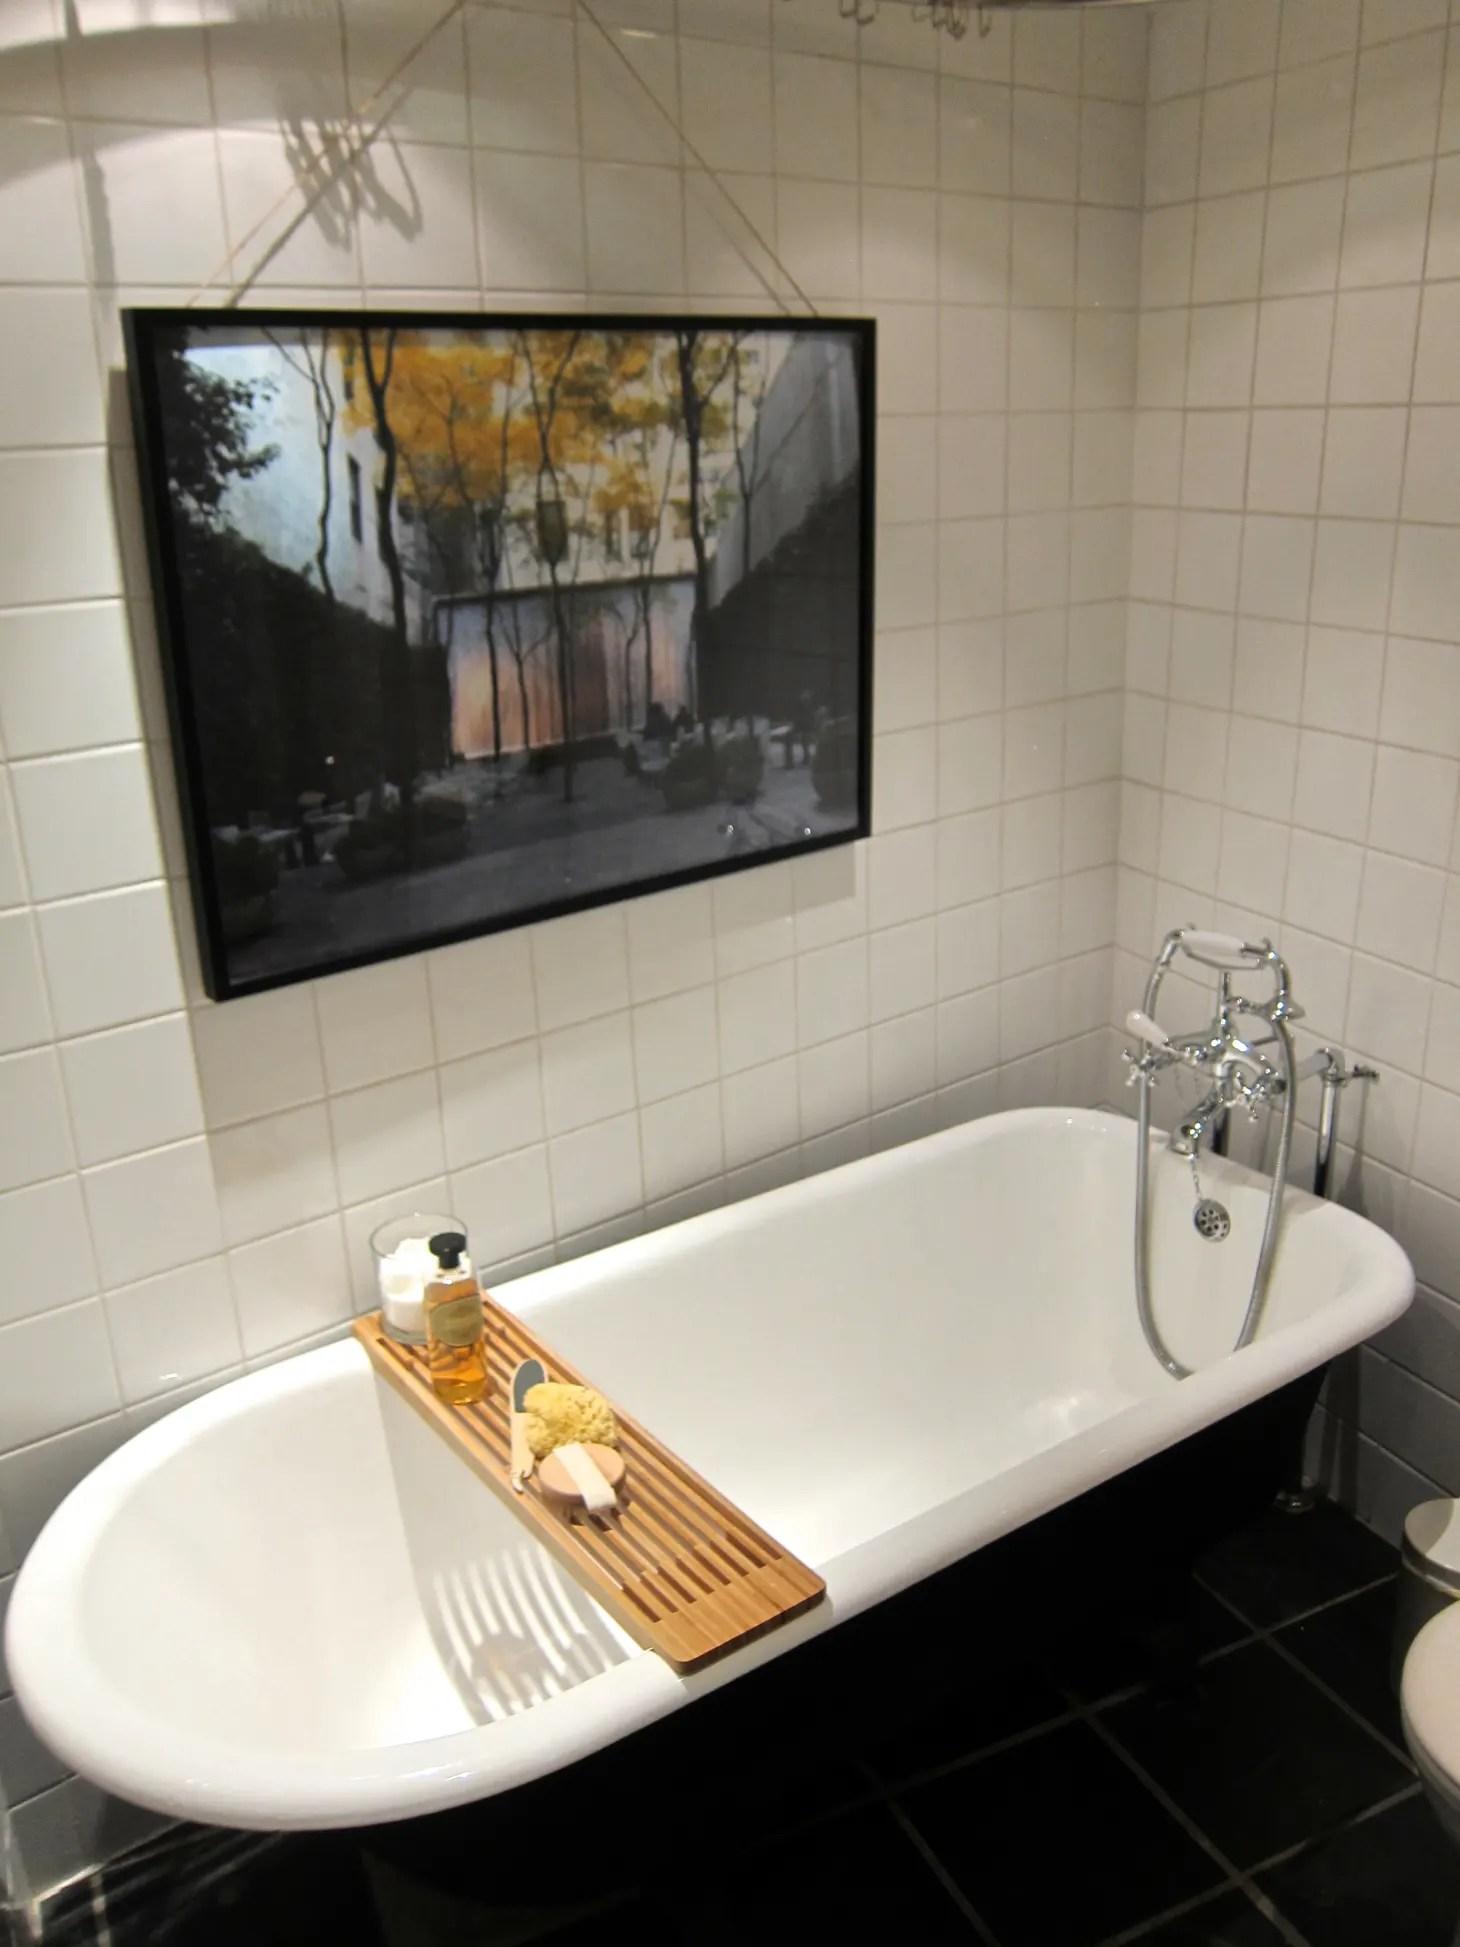 Bathroom Decorating Ideas: 5 Ways to Make Any Bathroom ... on Apartment Bathroom Ideas  id=30285